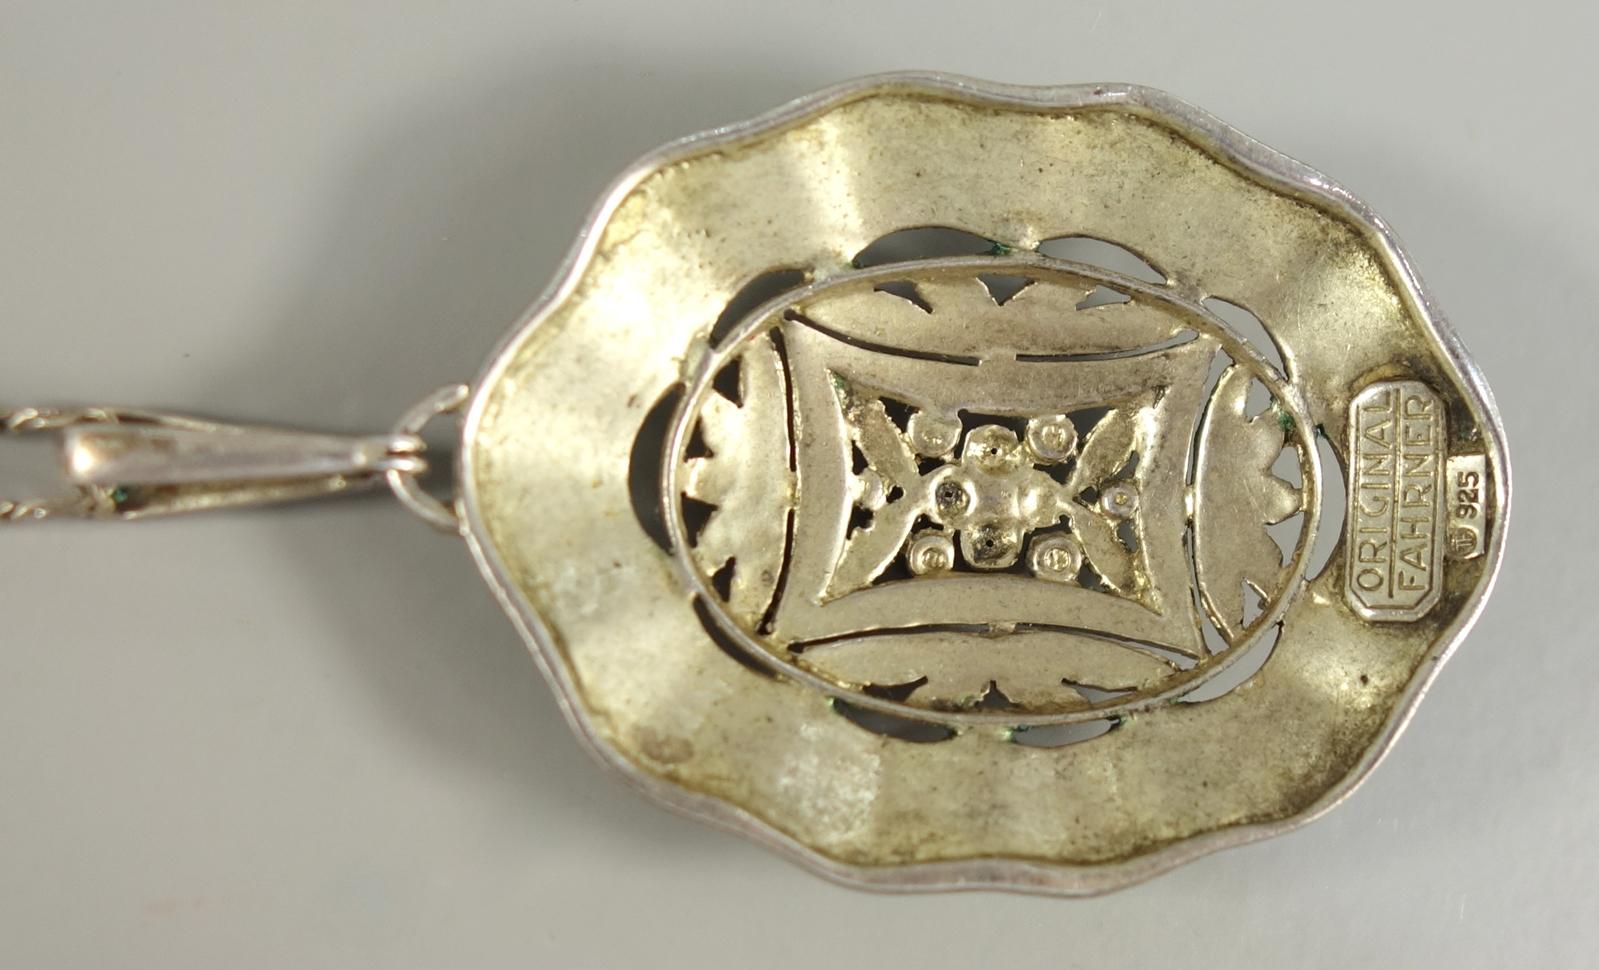 Anhänger, Theodor Fahrner, 925er Silber, 1930er Jahre, an 835er Silberkette, Gew.14,70g, - Bild 3 aus 4